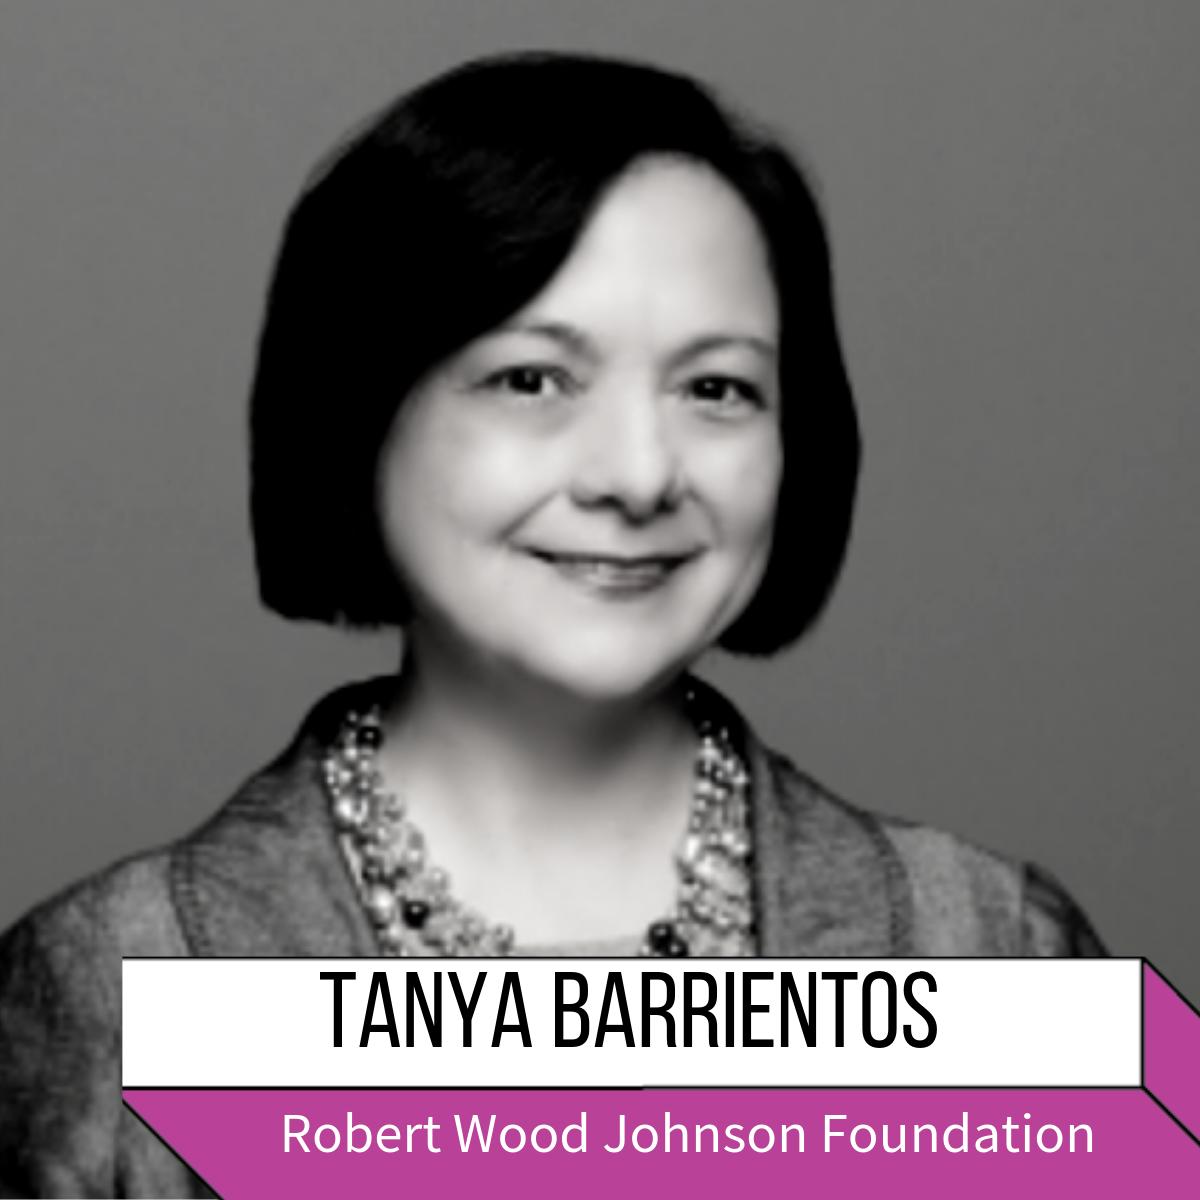 Tanya Barrientos Org.png